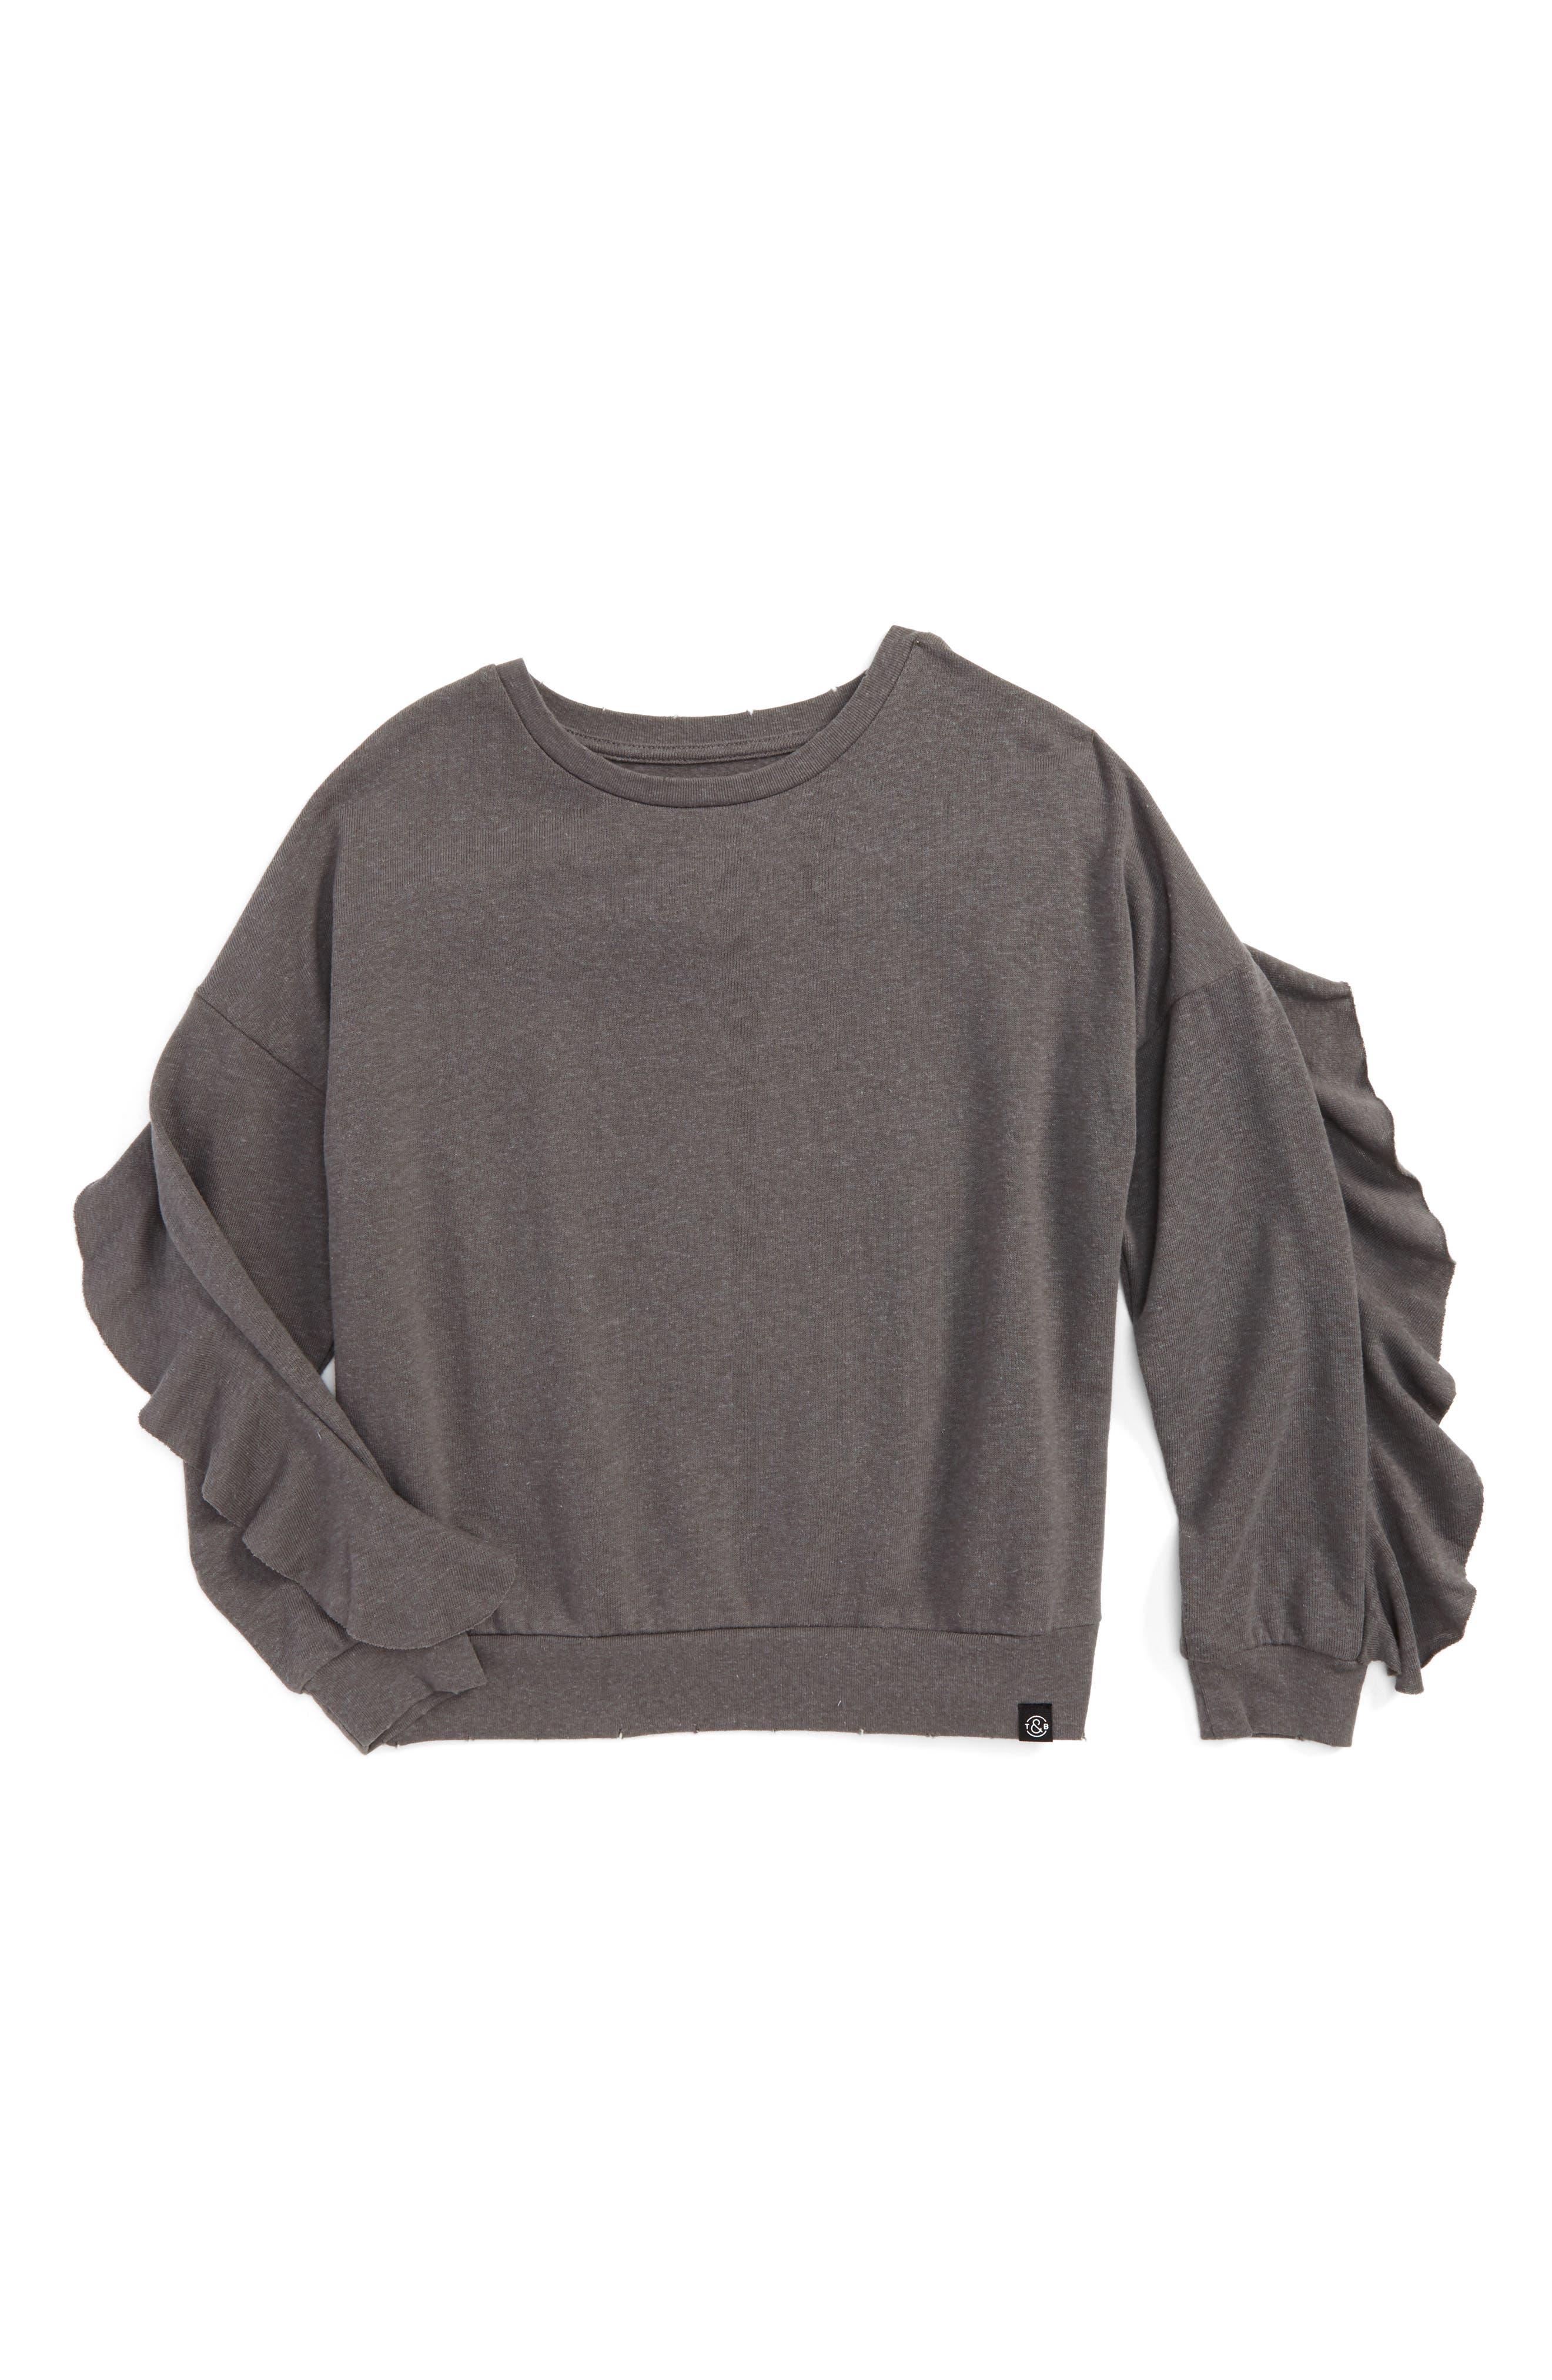 Ruffle Sweatshirt,                             Main thumbnail 1, color,                             030